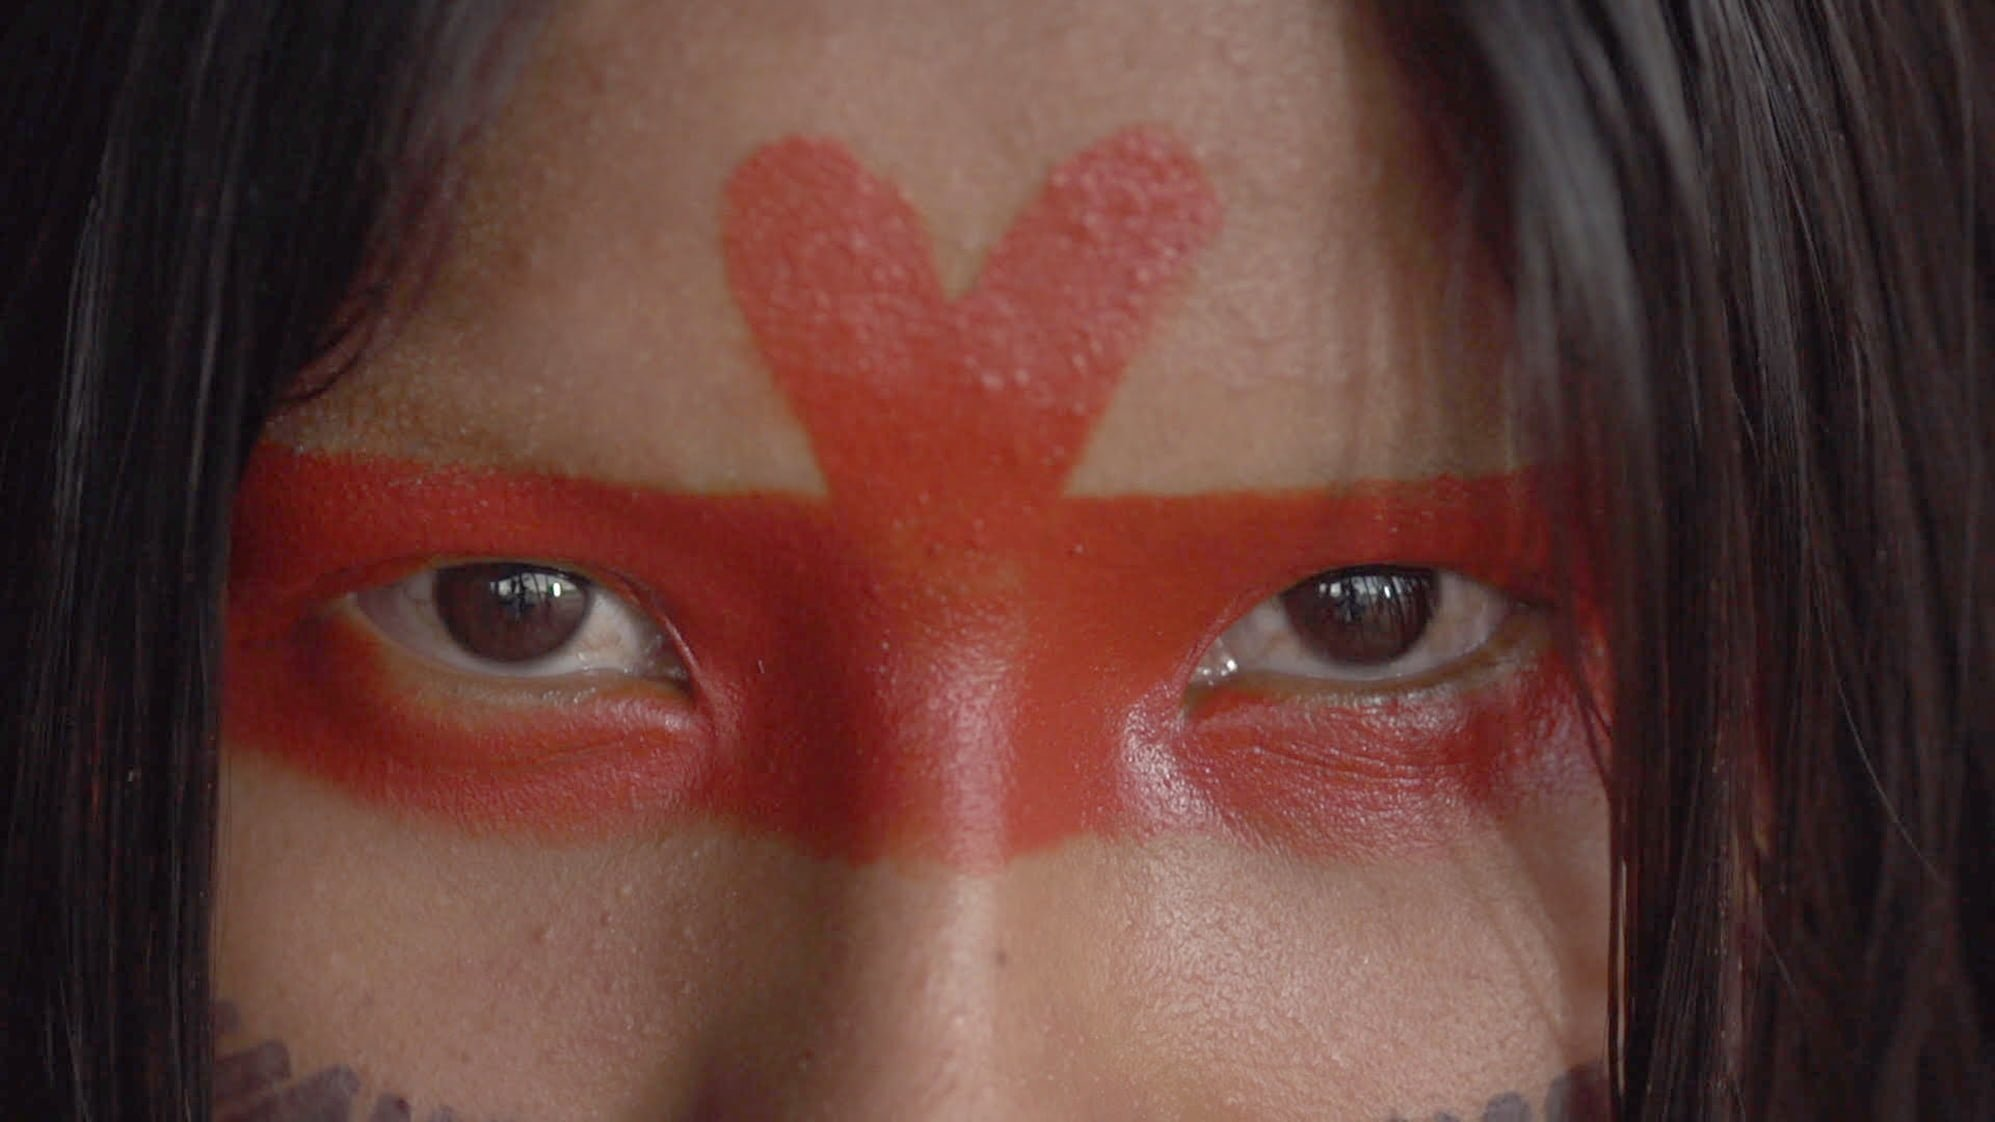 Amazonia Sociedade Anonima